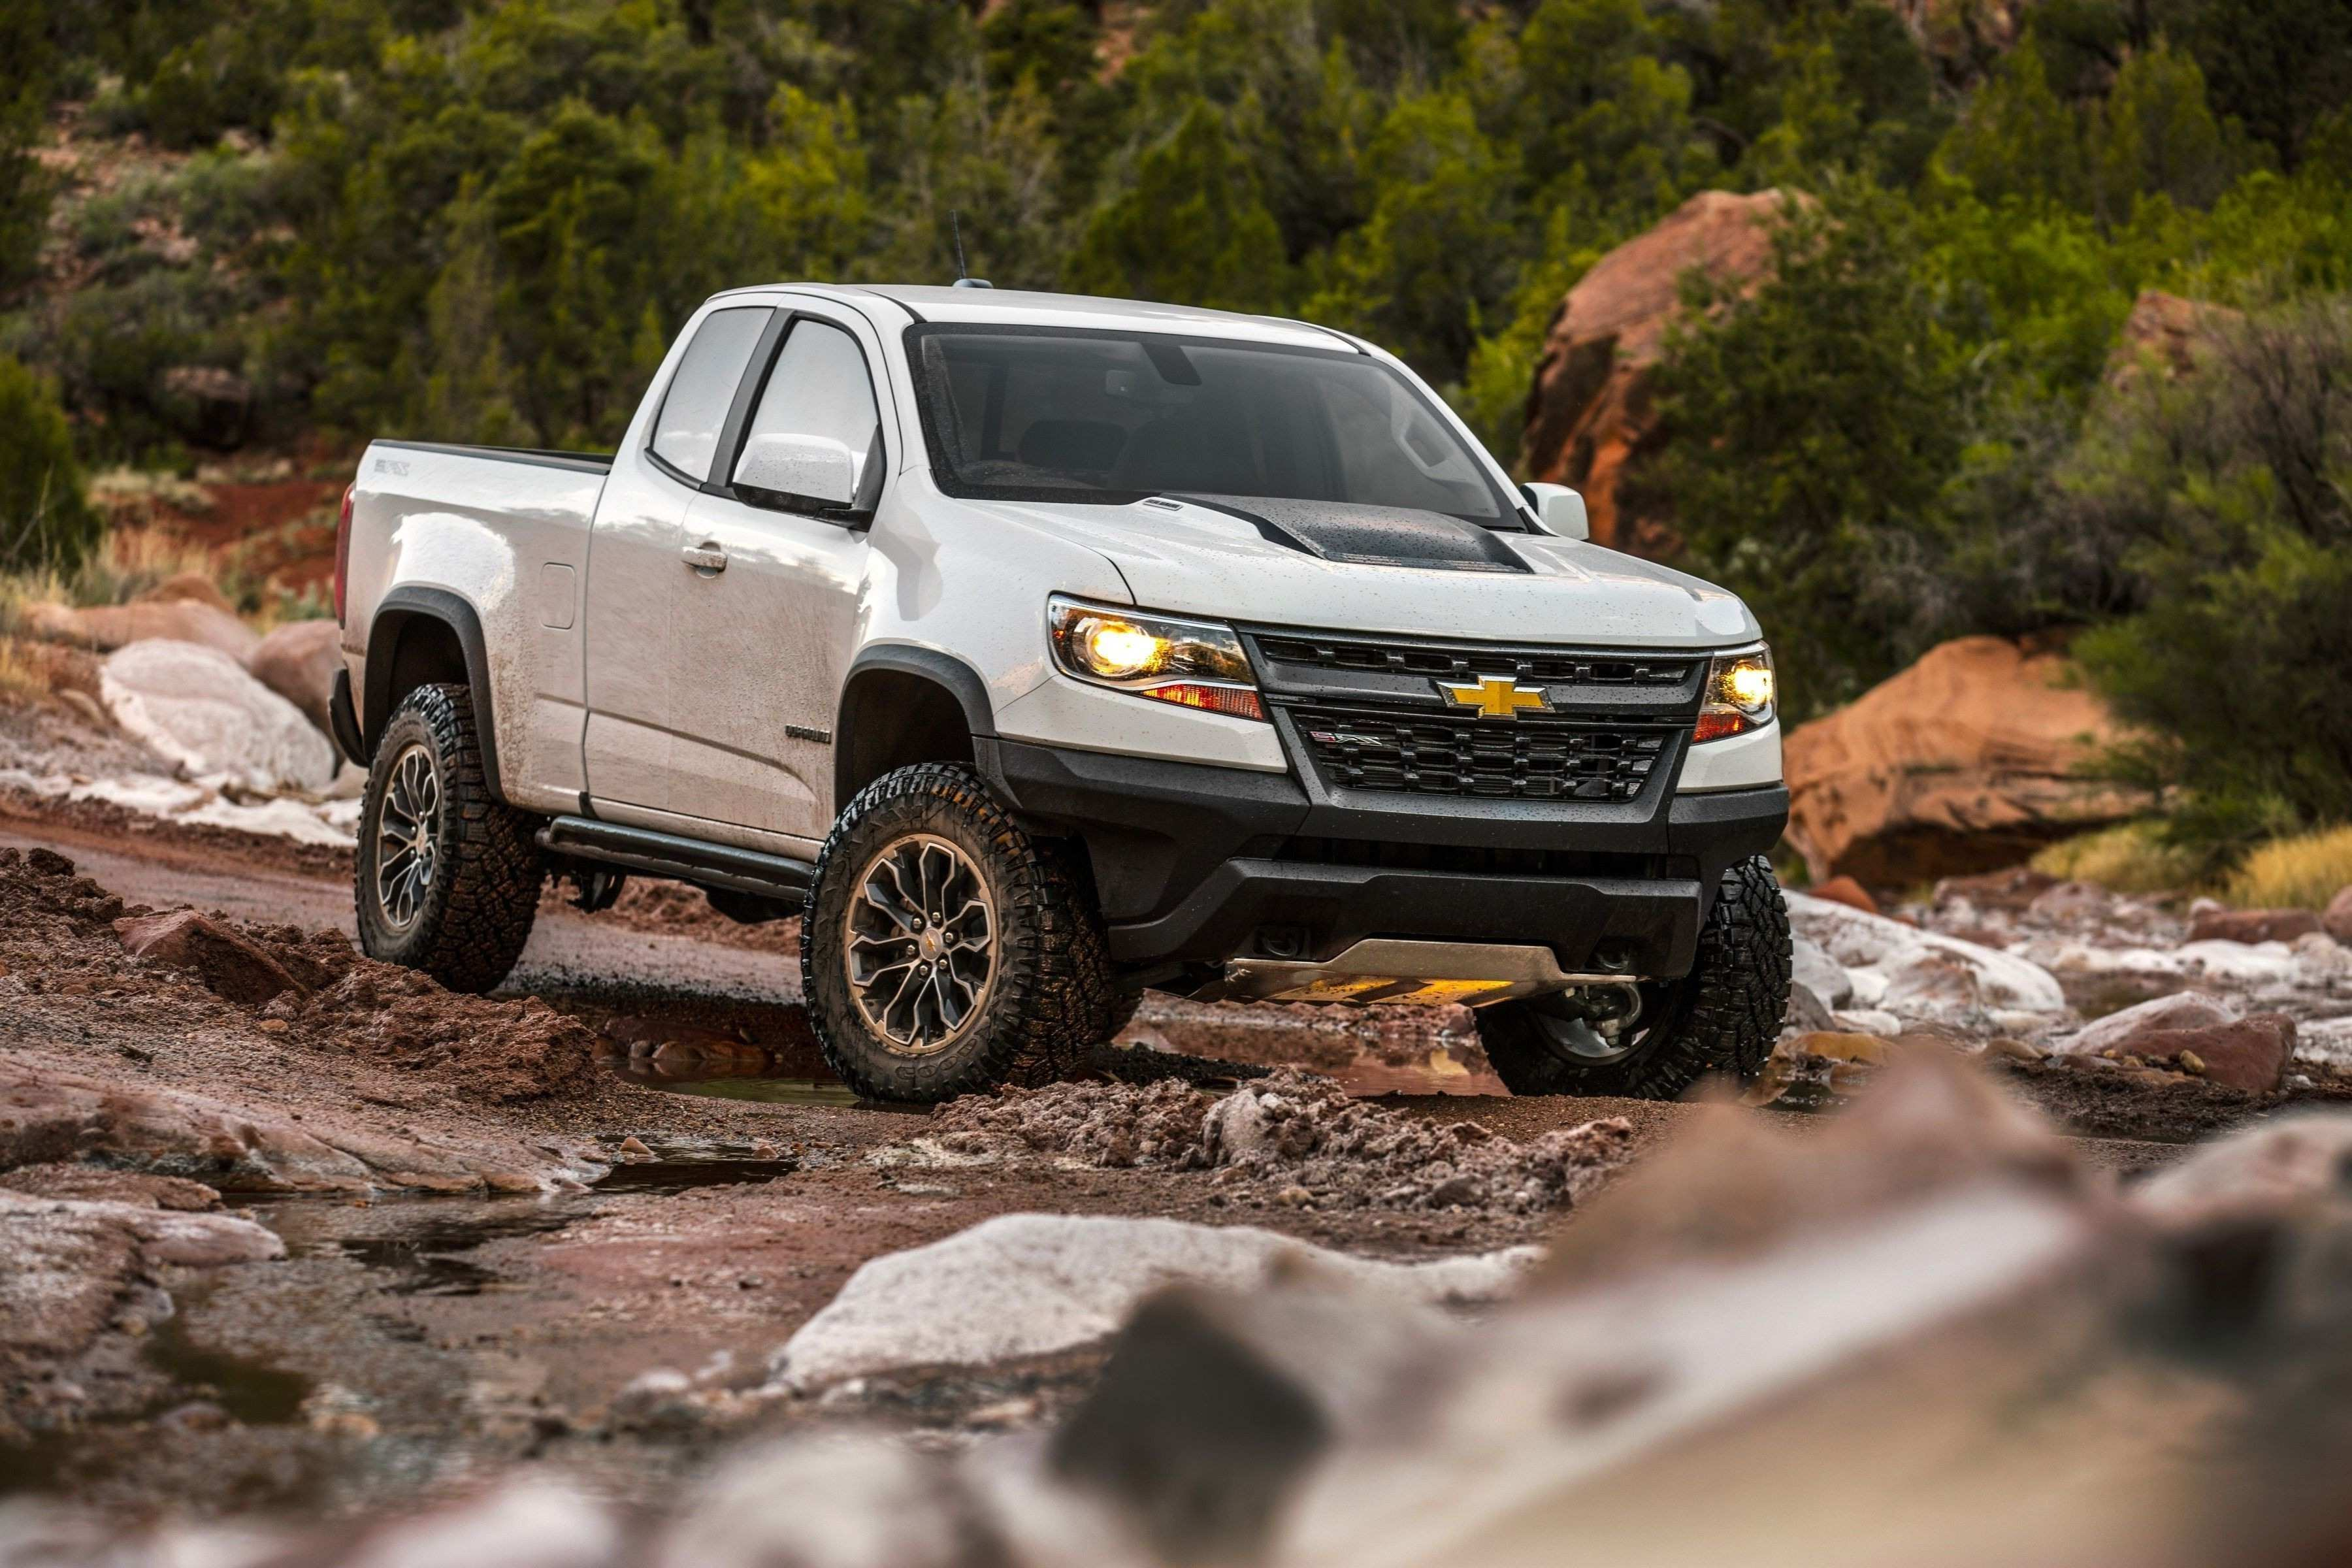 40 Best Review 2020 Chevrolet Colorado Z72 New Concept by 2020 Chevrolet Colorado Z72